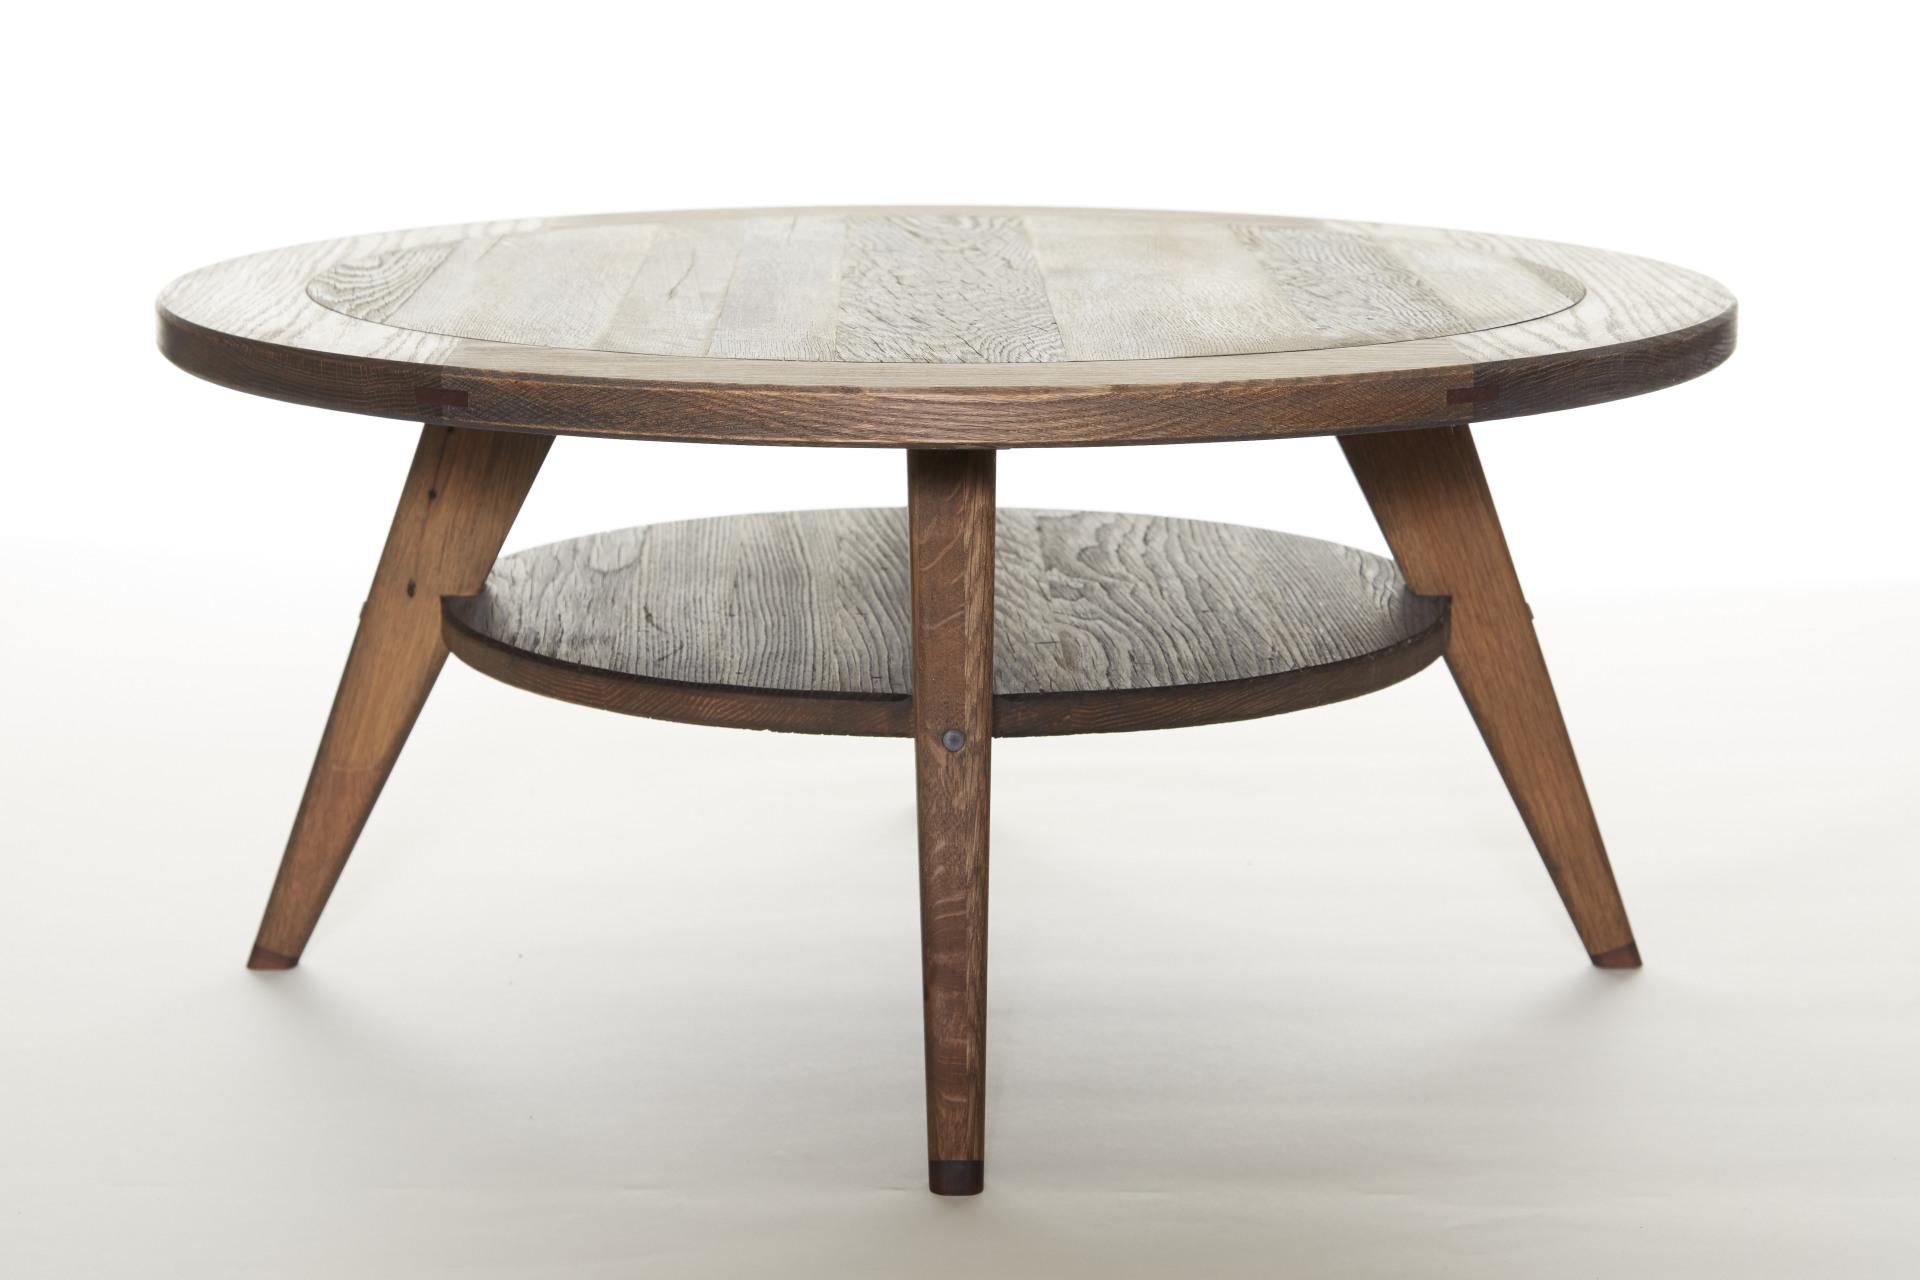 Reclaimed Oak Coffee Table, Mid Century Influence